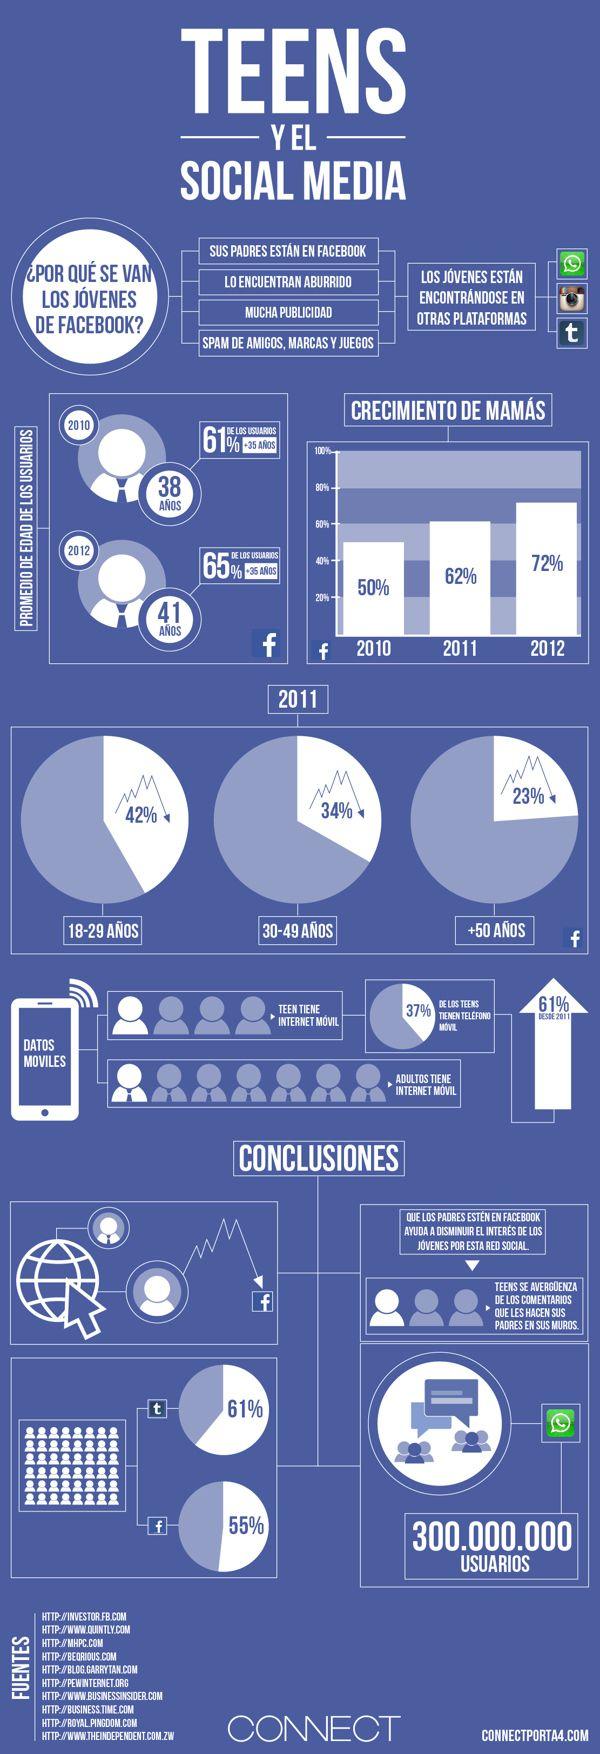 Teens y Redes Sociales #infografia #infographic #socialmedia